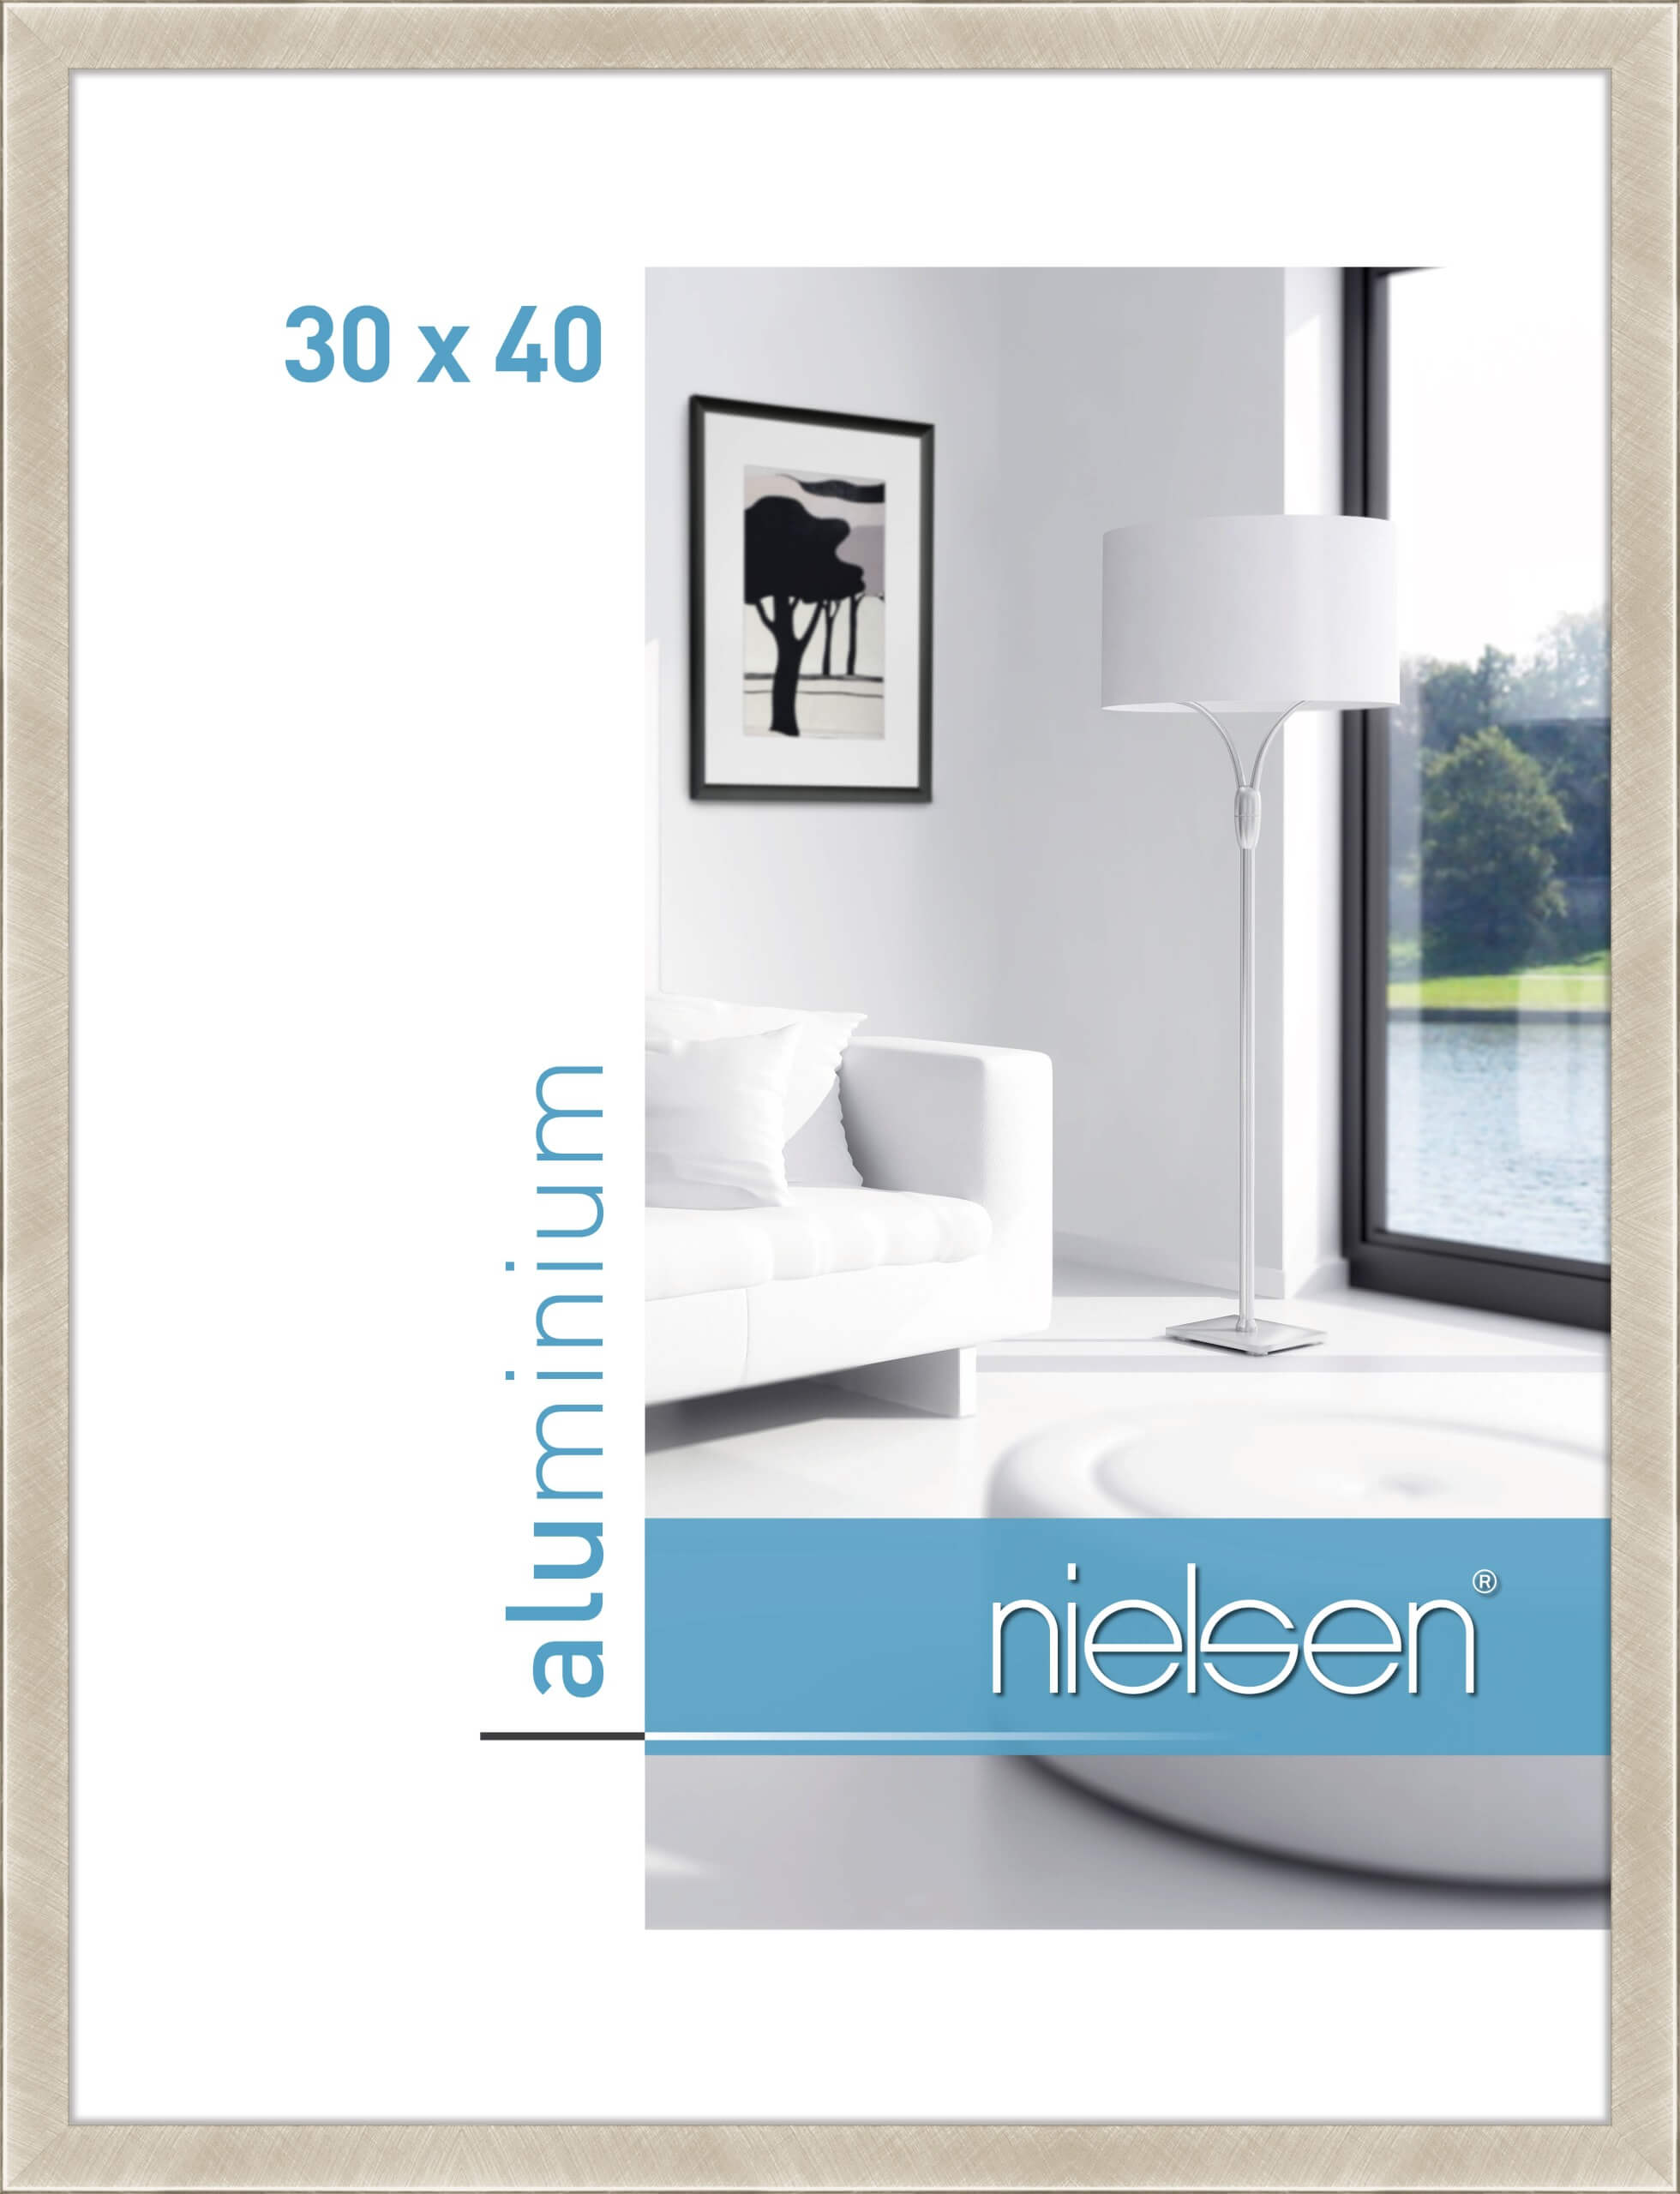 cristal aluminium bilderrahmen produkte nielsen. Black Bedroom Furniture Sets. Home Design Ideas